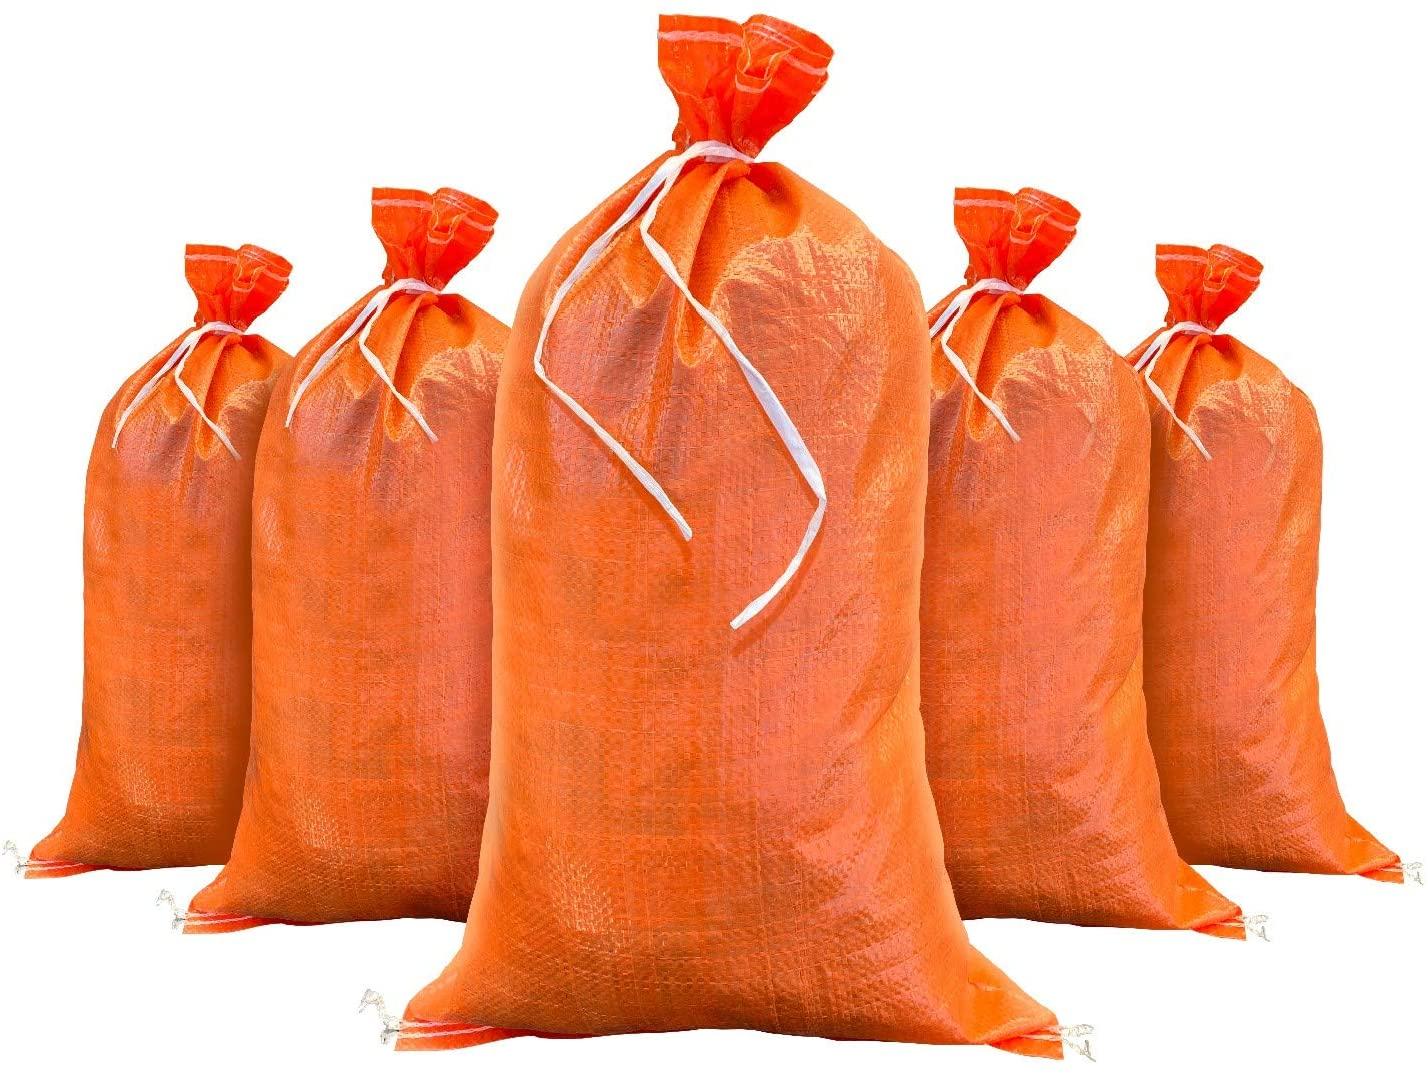 Sandbags for Flooding - Size: 14 Inch x 26 Inch - Orange - Sand Bag - Flood Water Barrier - Water Curb - Tent Store Bags by Sandbaggy (1000 Orange Sandbags)